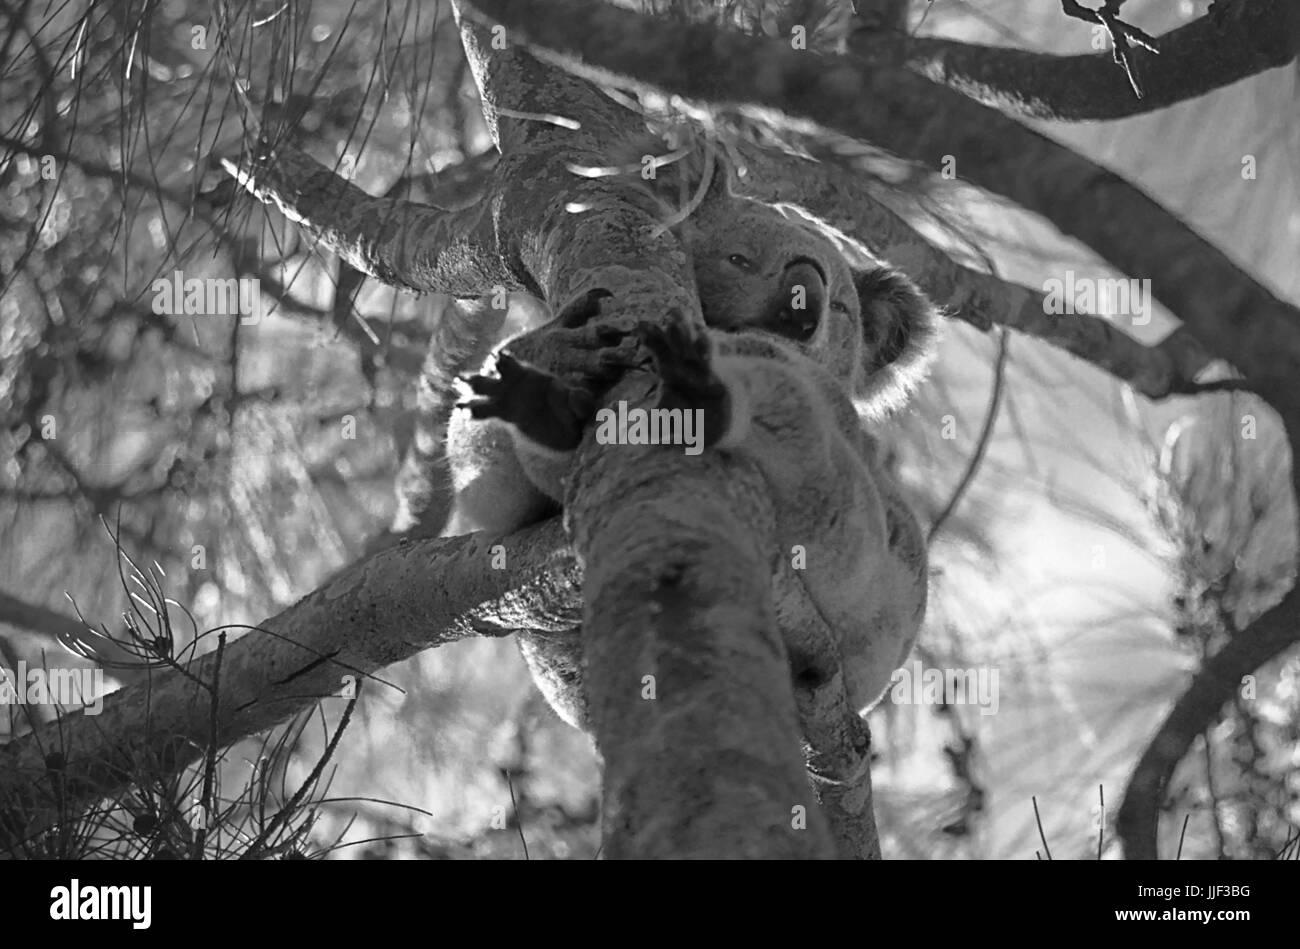 Koala (Phascolarctos cinereus) sitting on a branch of a eucalypt, Lemon Tree Passage, Port Stephens, NSW, Australia: - Stock Image